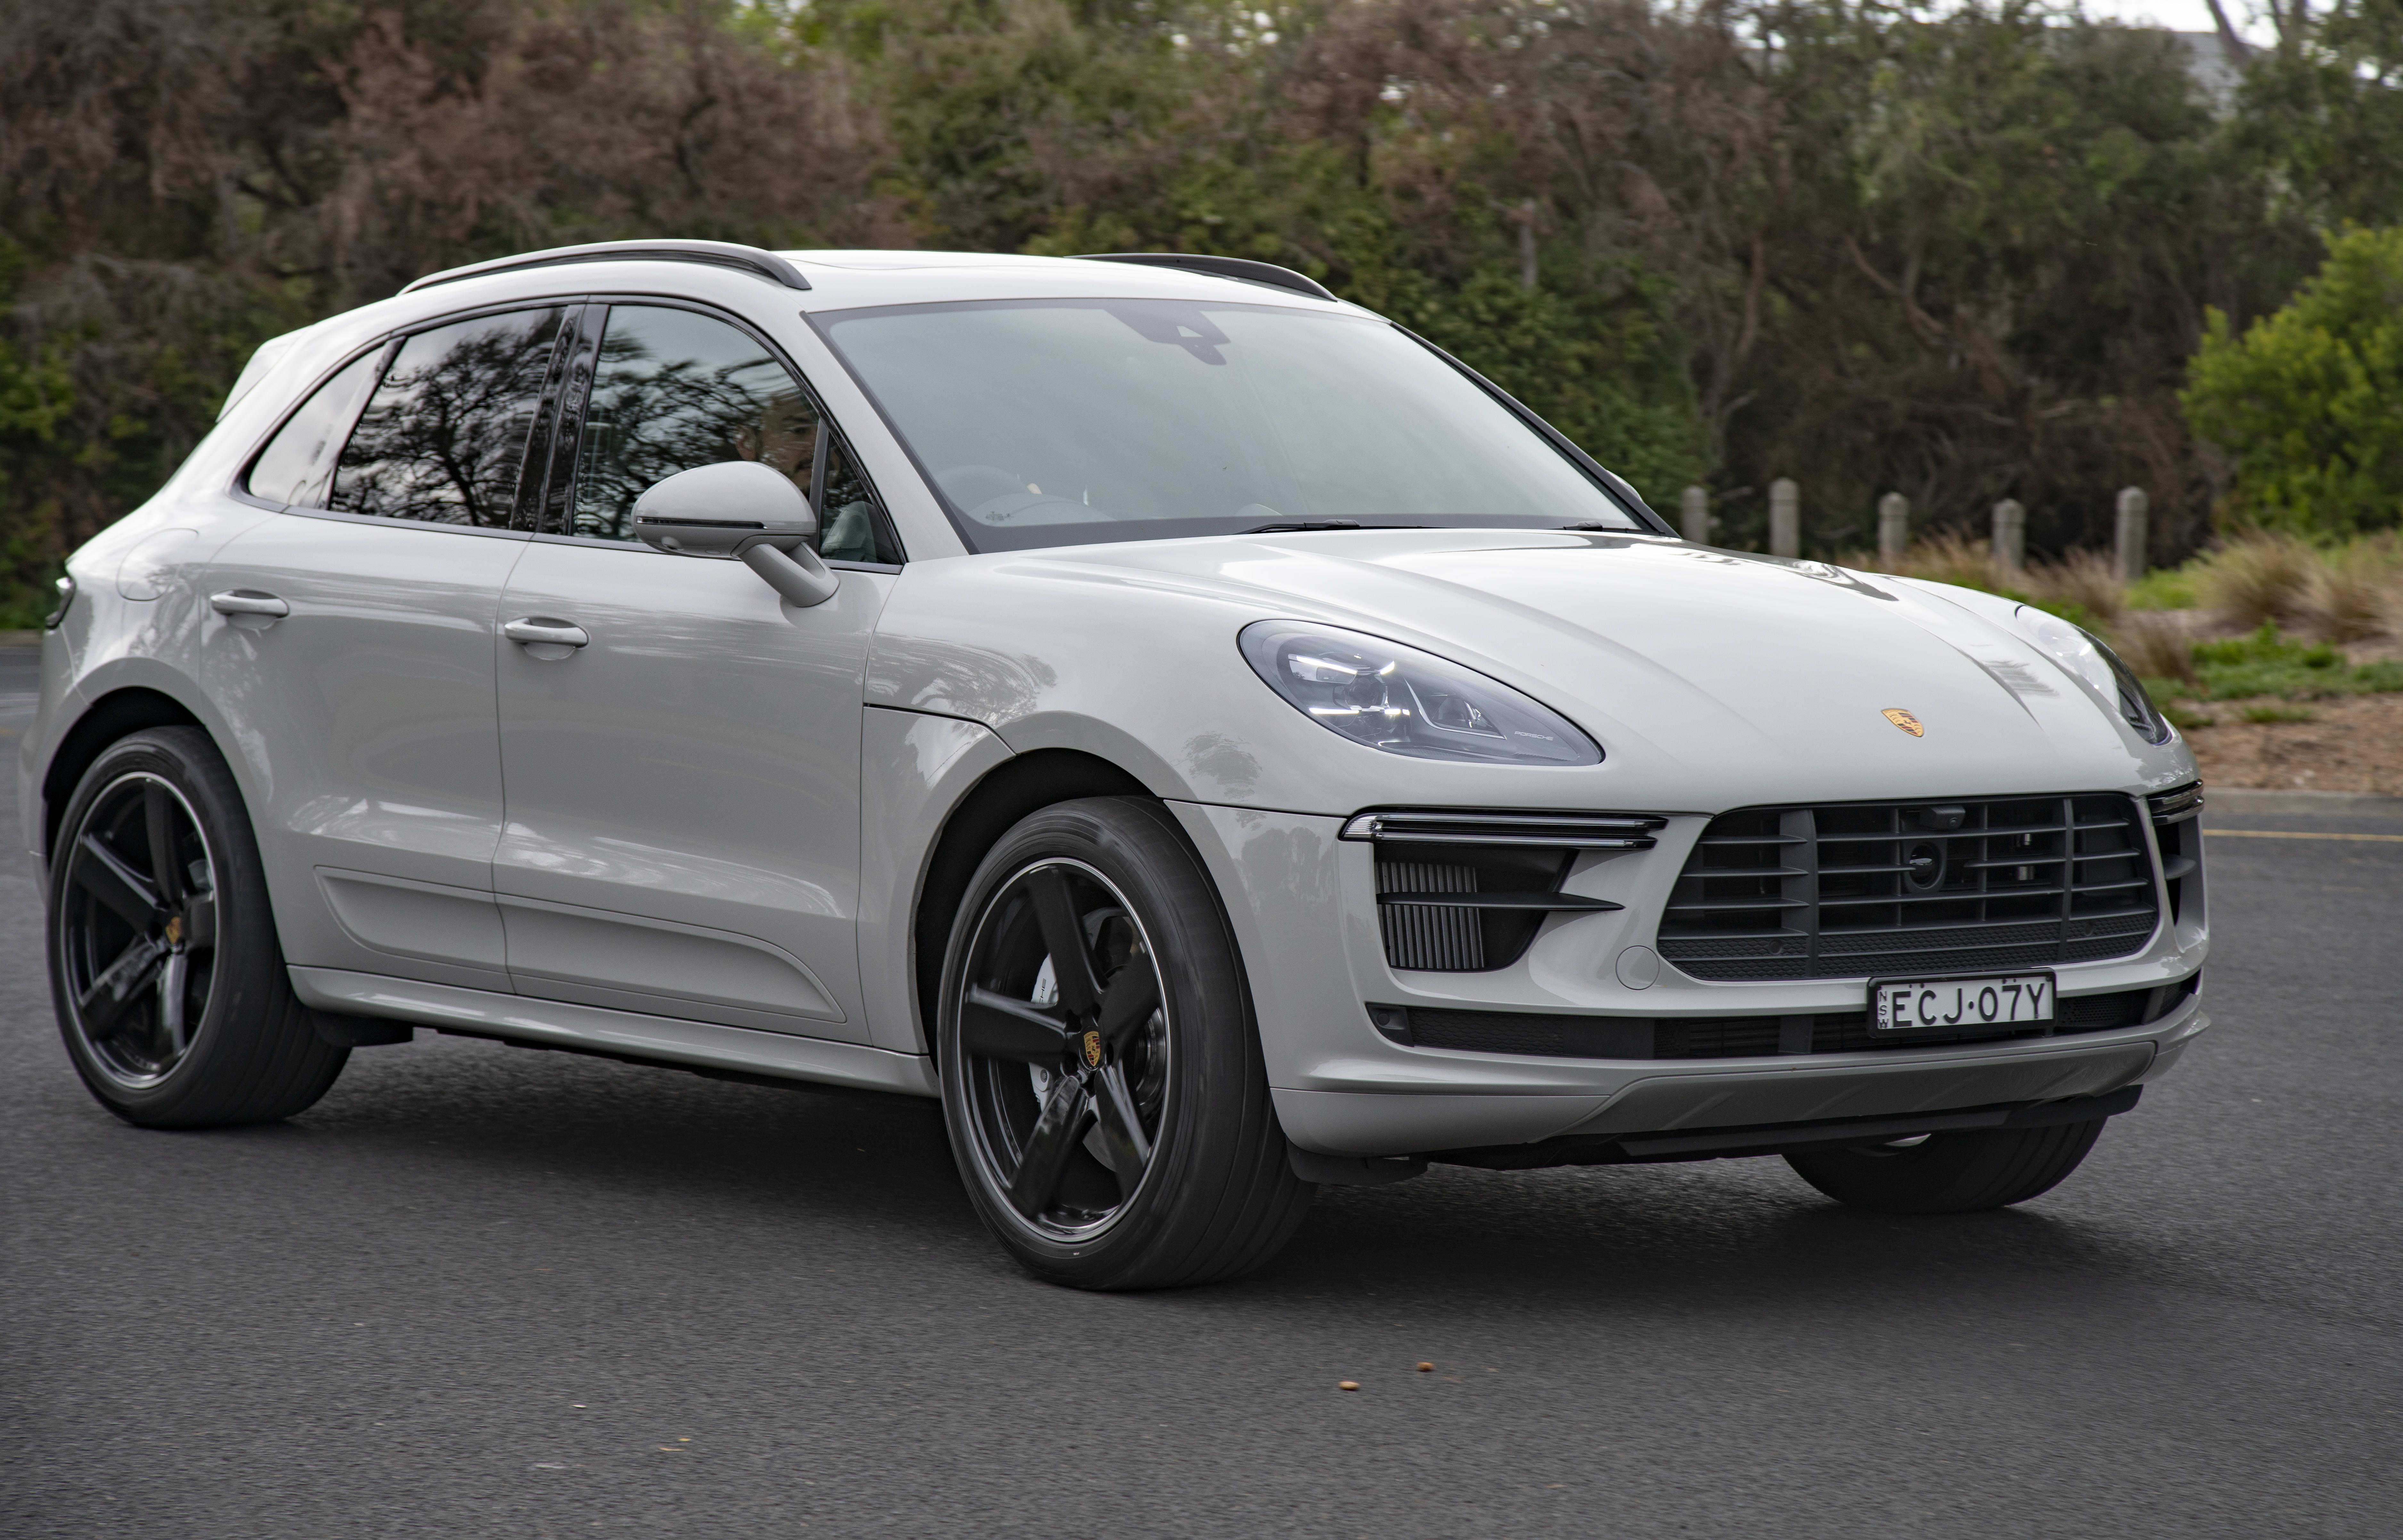 2020 Porsche Macan Turbo review